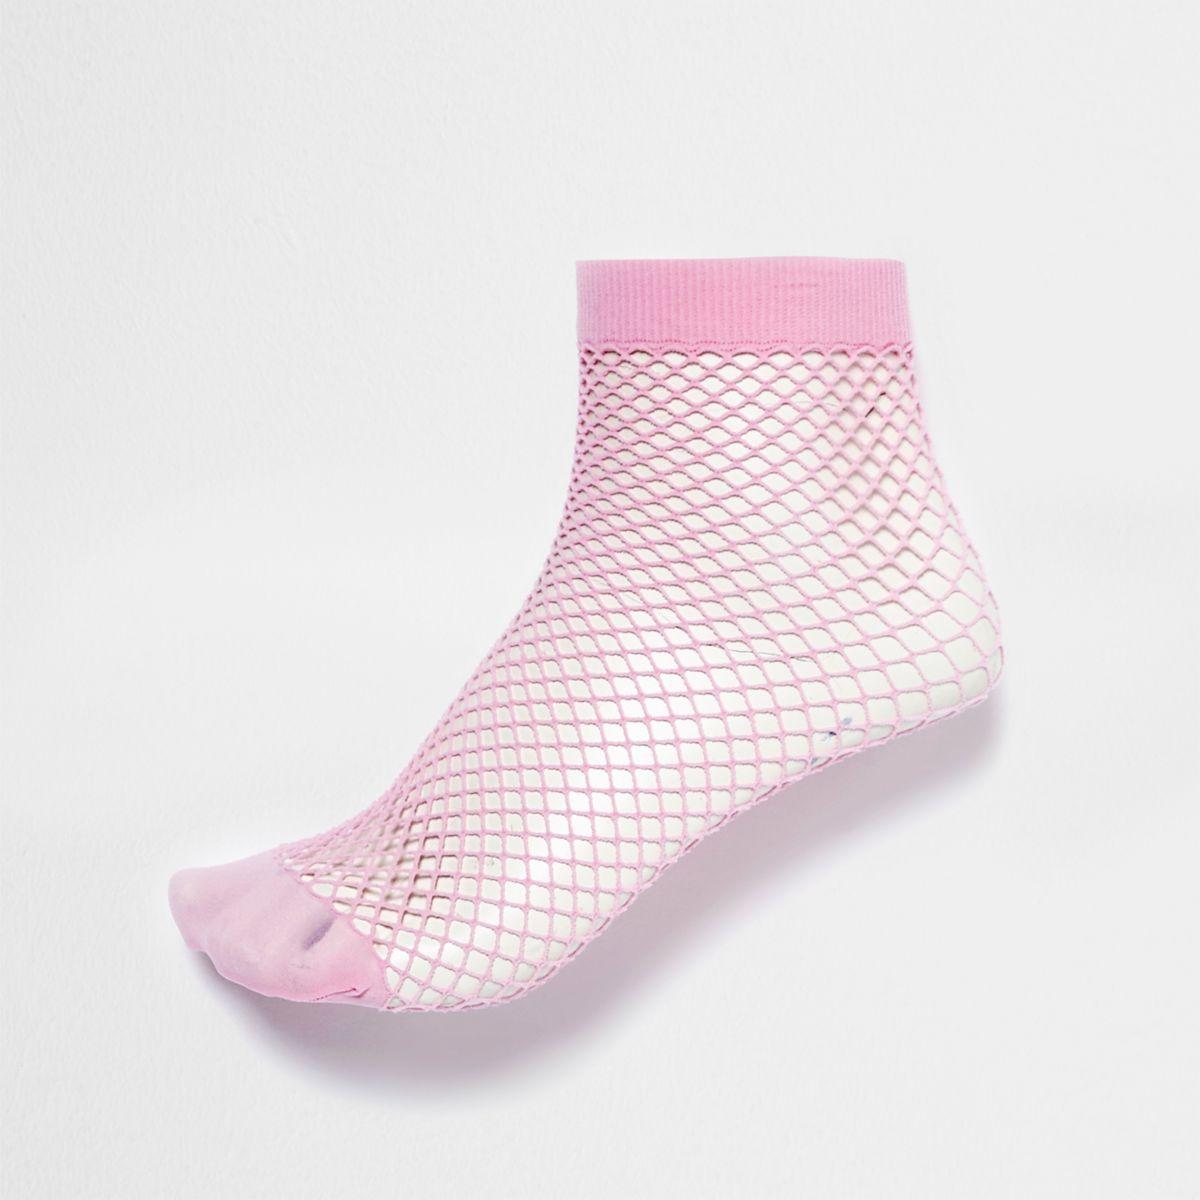 Pink wide fishnet socks